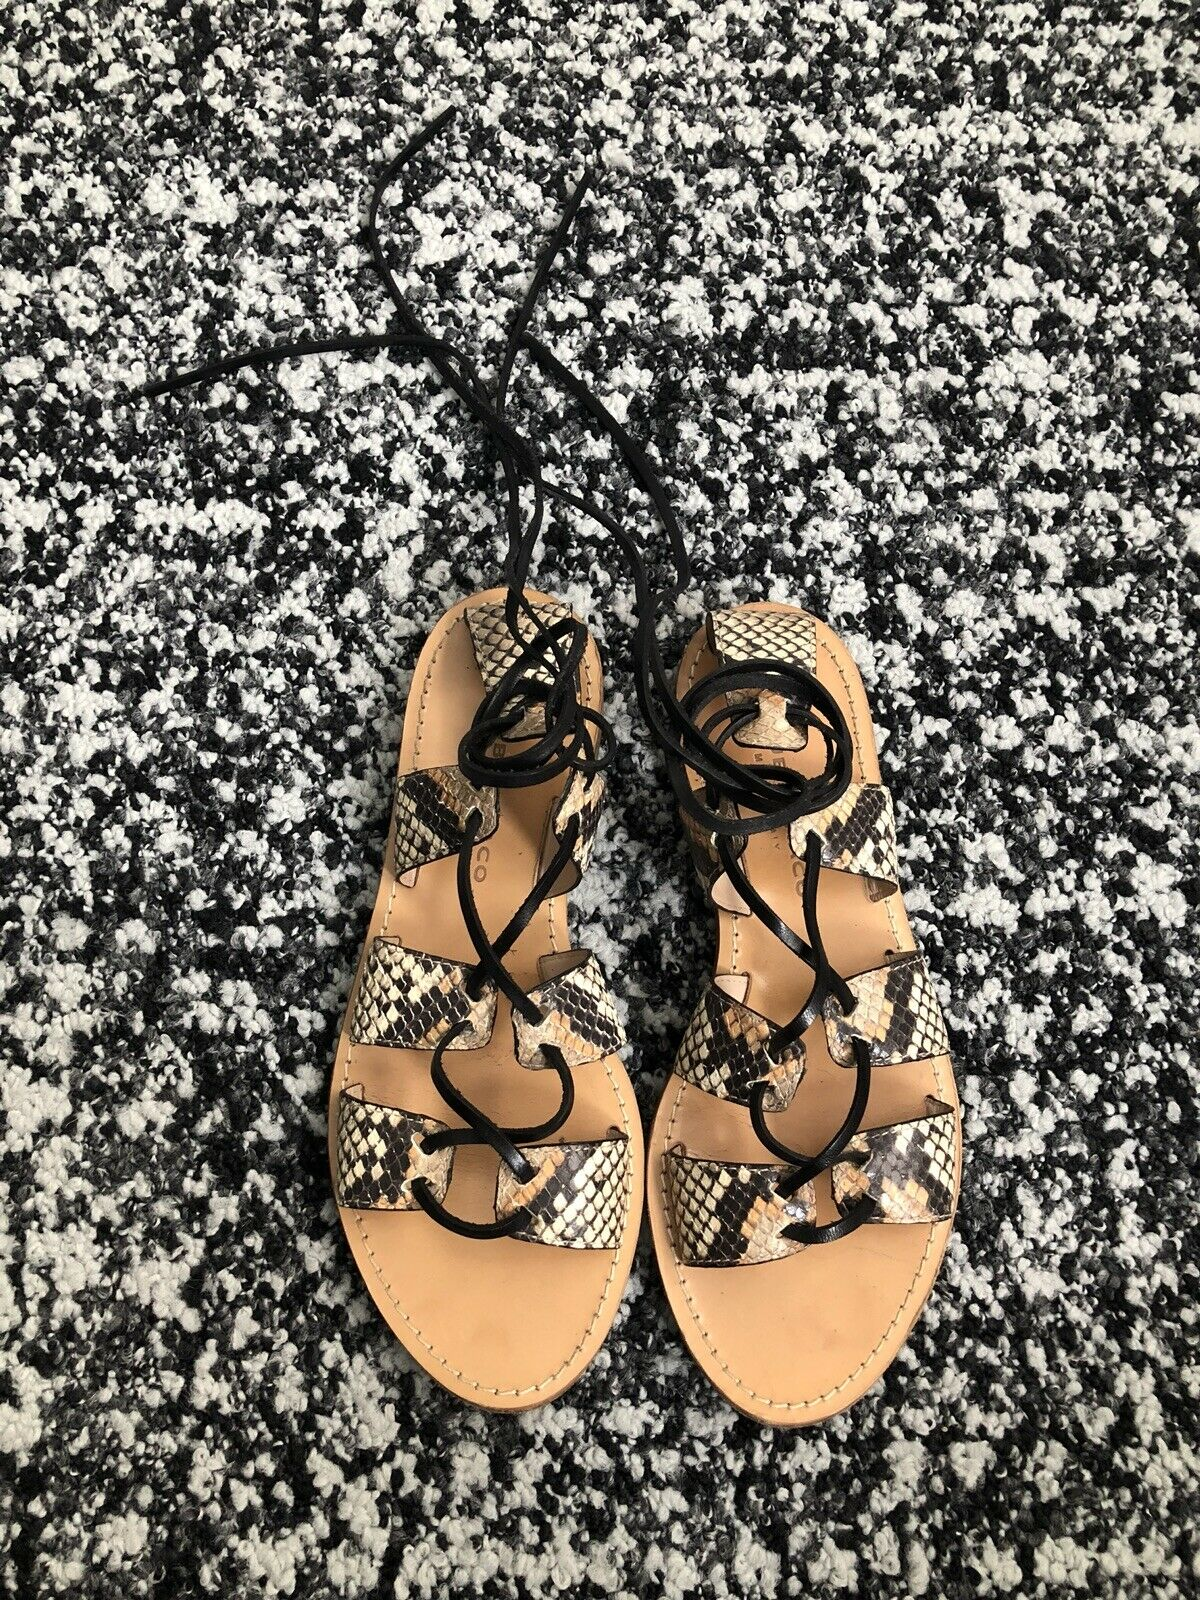 Club Monaco Thiais Tie Sandals donna donna donna SZ 6.5 scarpe Flats Snake nero AUTH  229 24732a